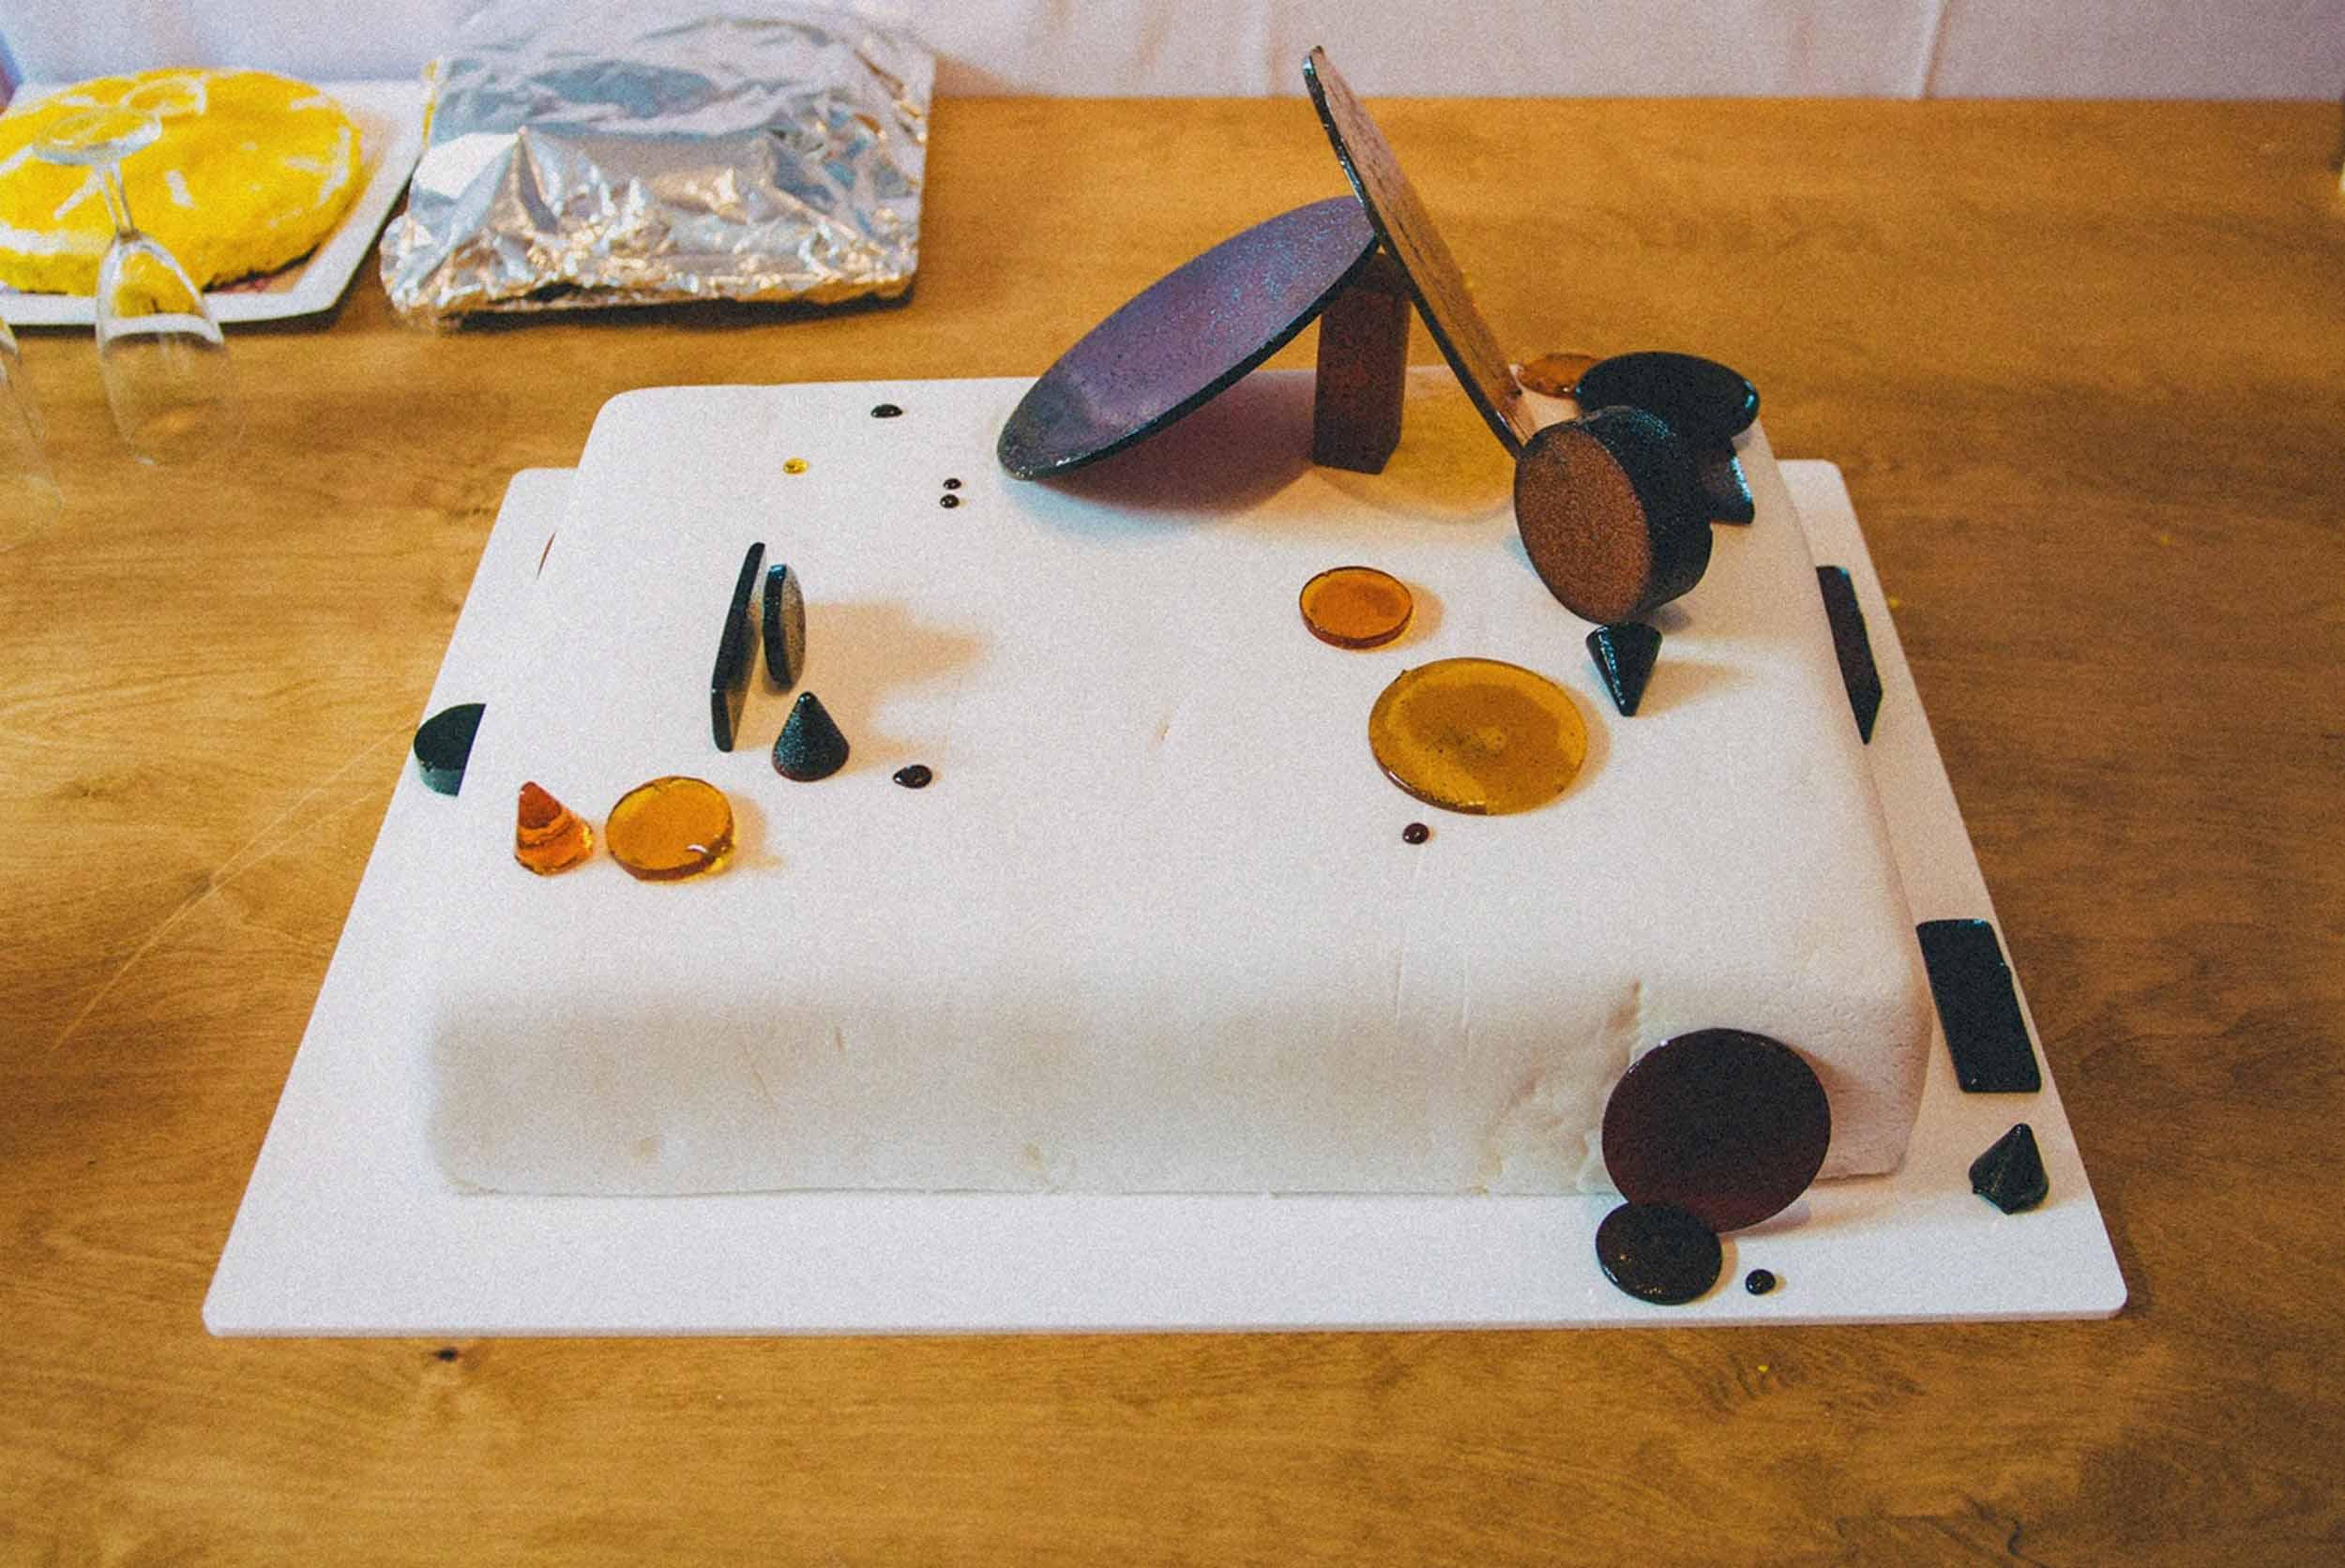 Arty geometric sugar glass wedding cake, by Studio Mali